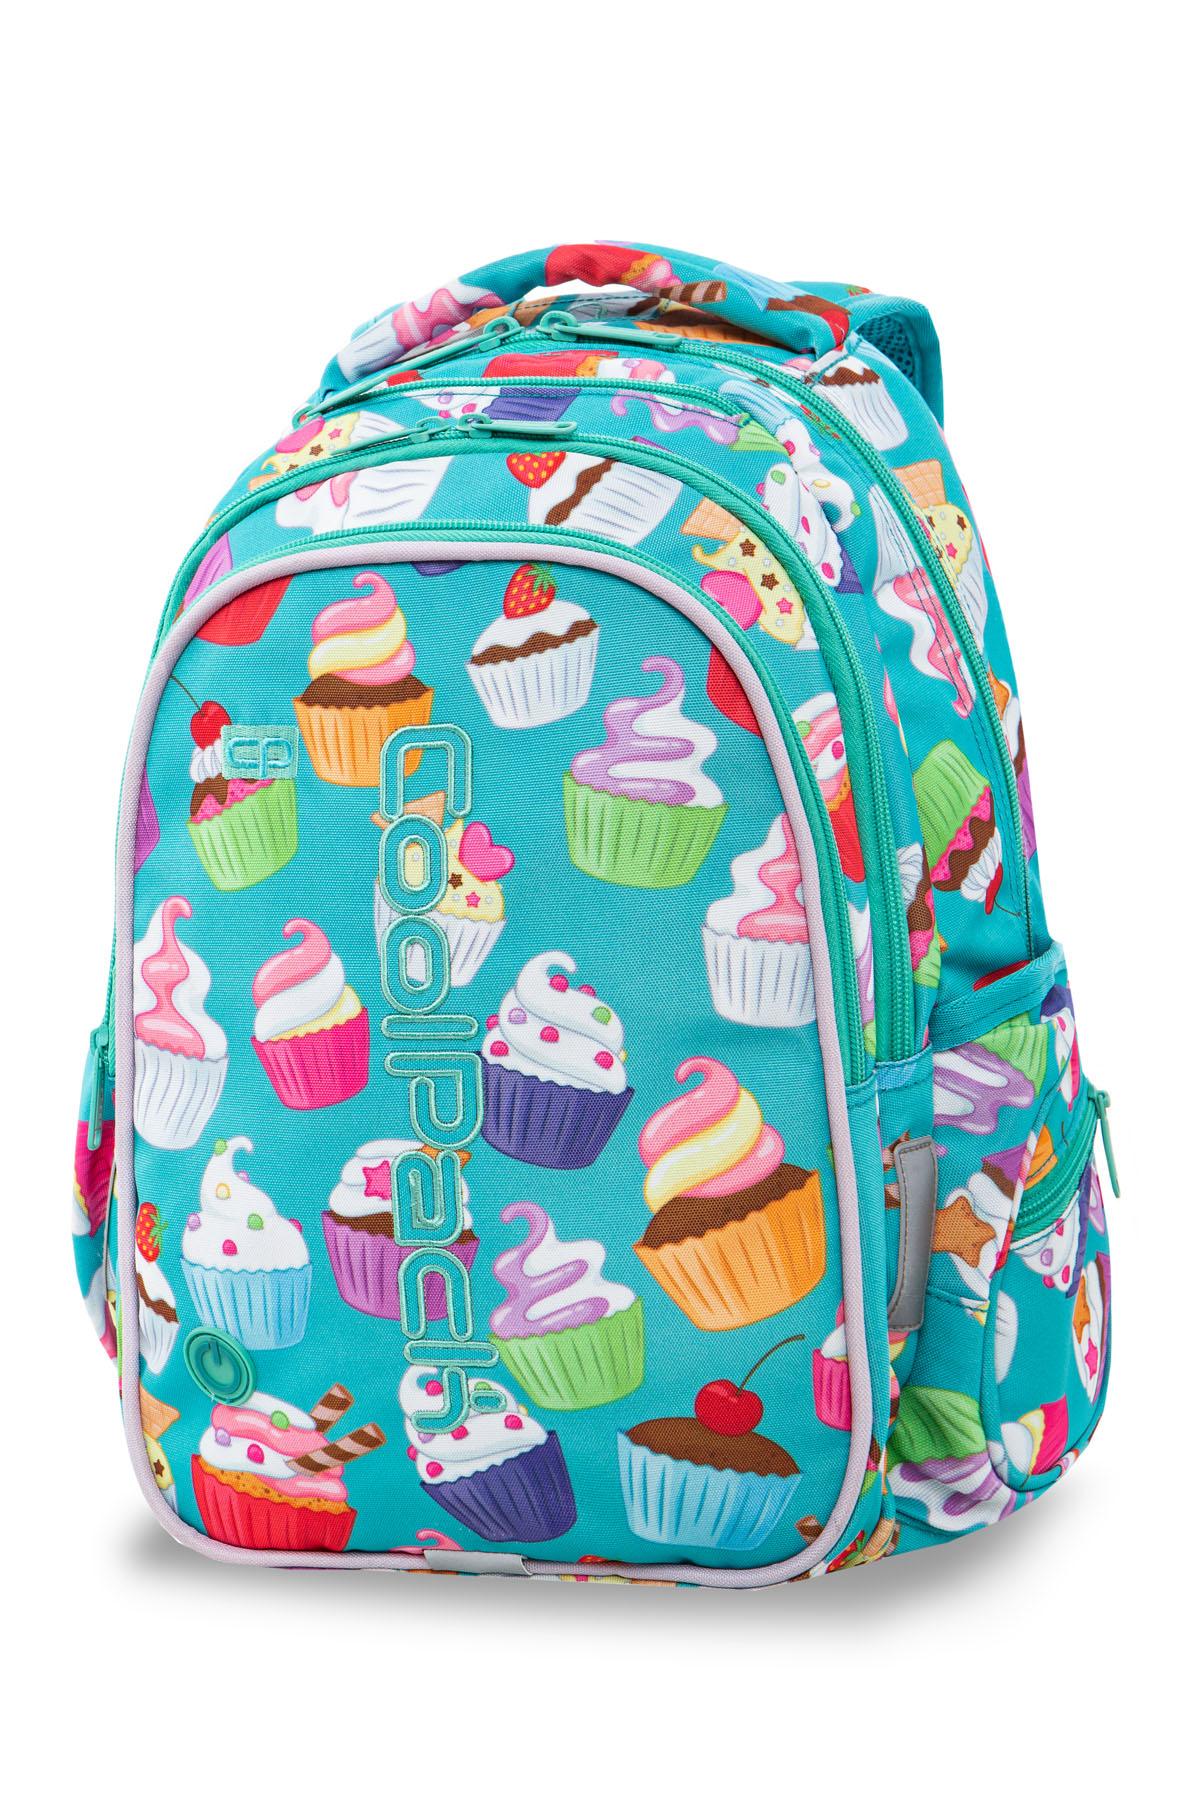 Coolpack   joy m  rygsæk   led cupcakes